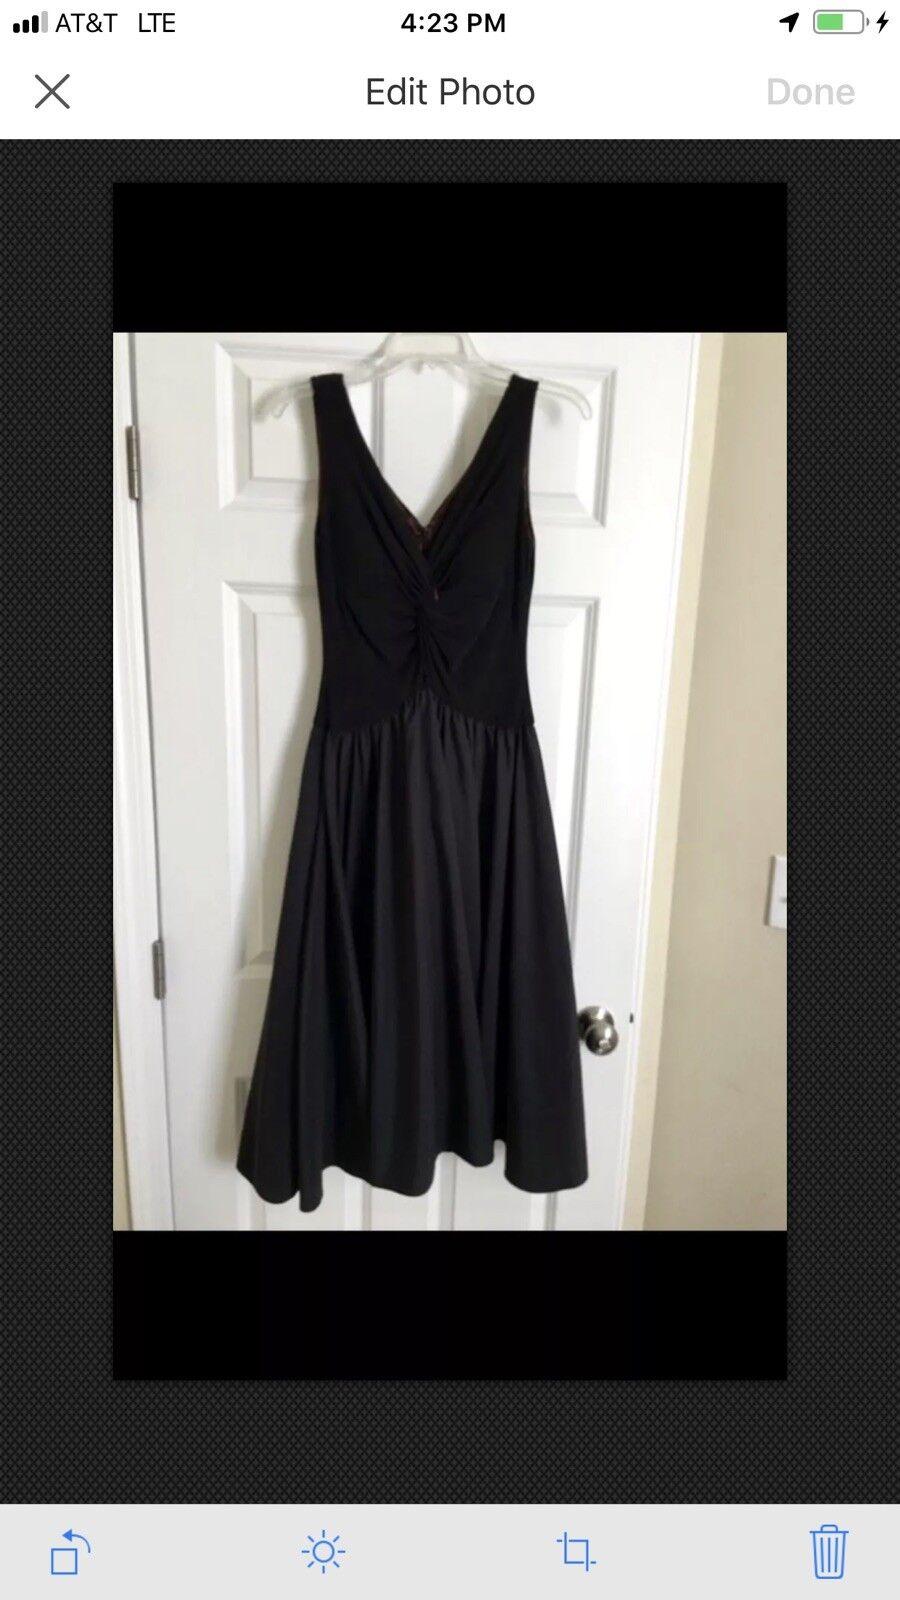 Elegant JESSICA HOWARD schwarz Dress Party Evening Cocktail Dressy Größe 6